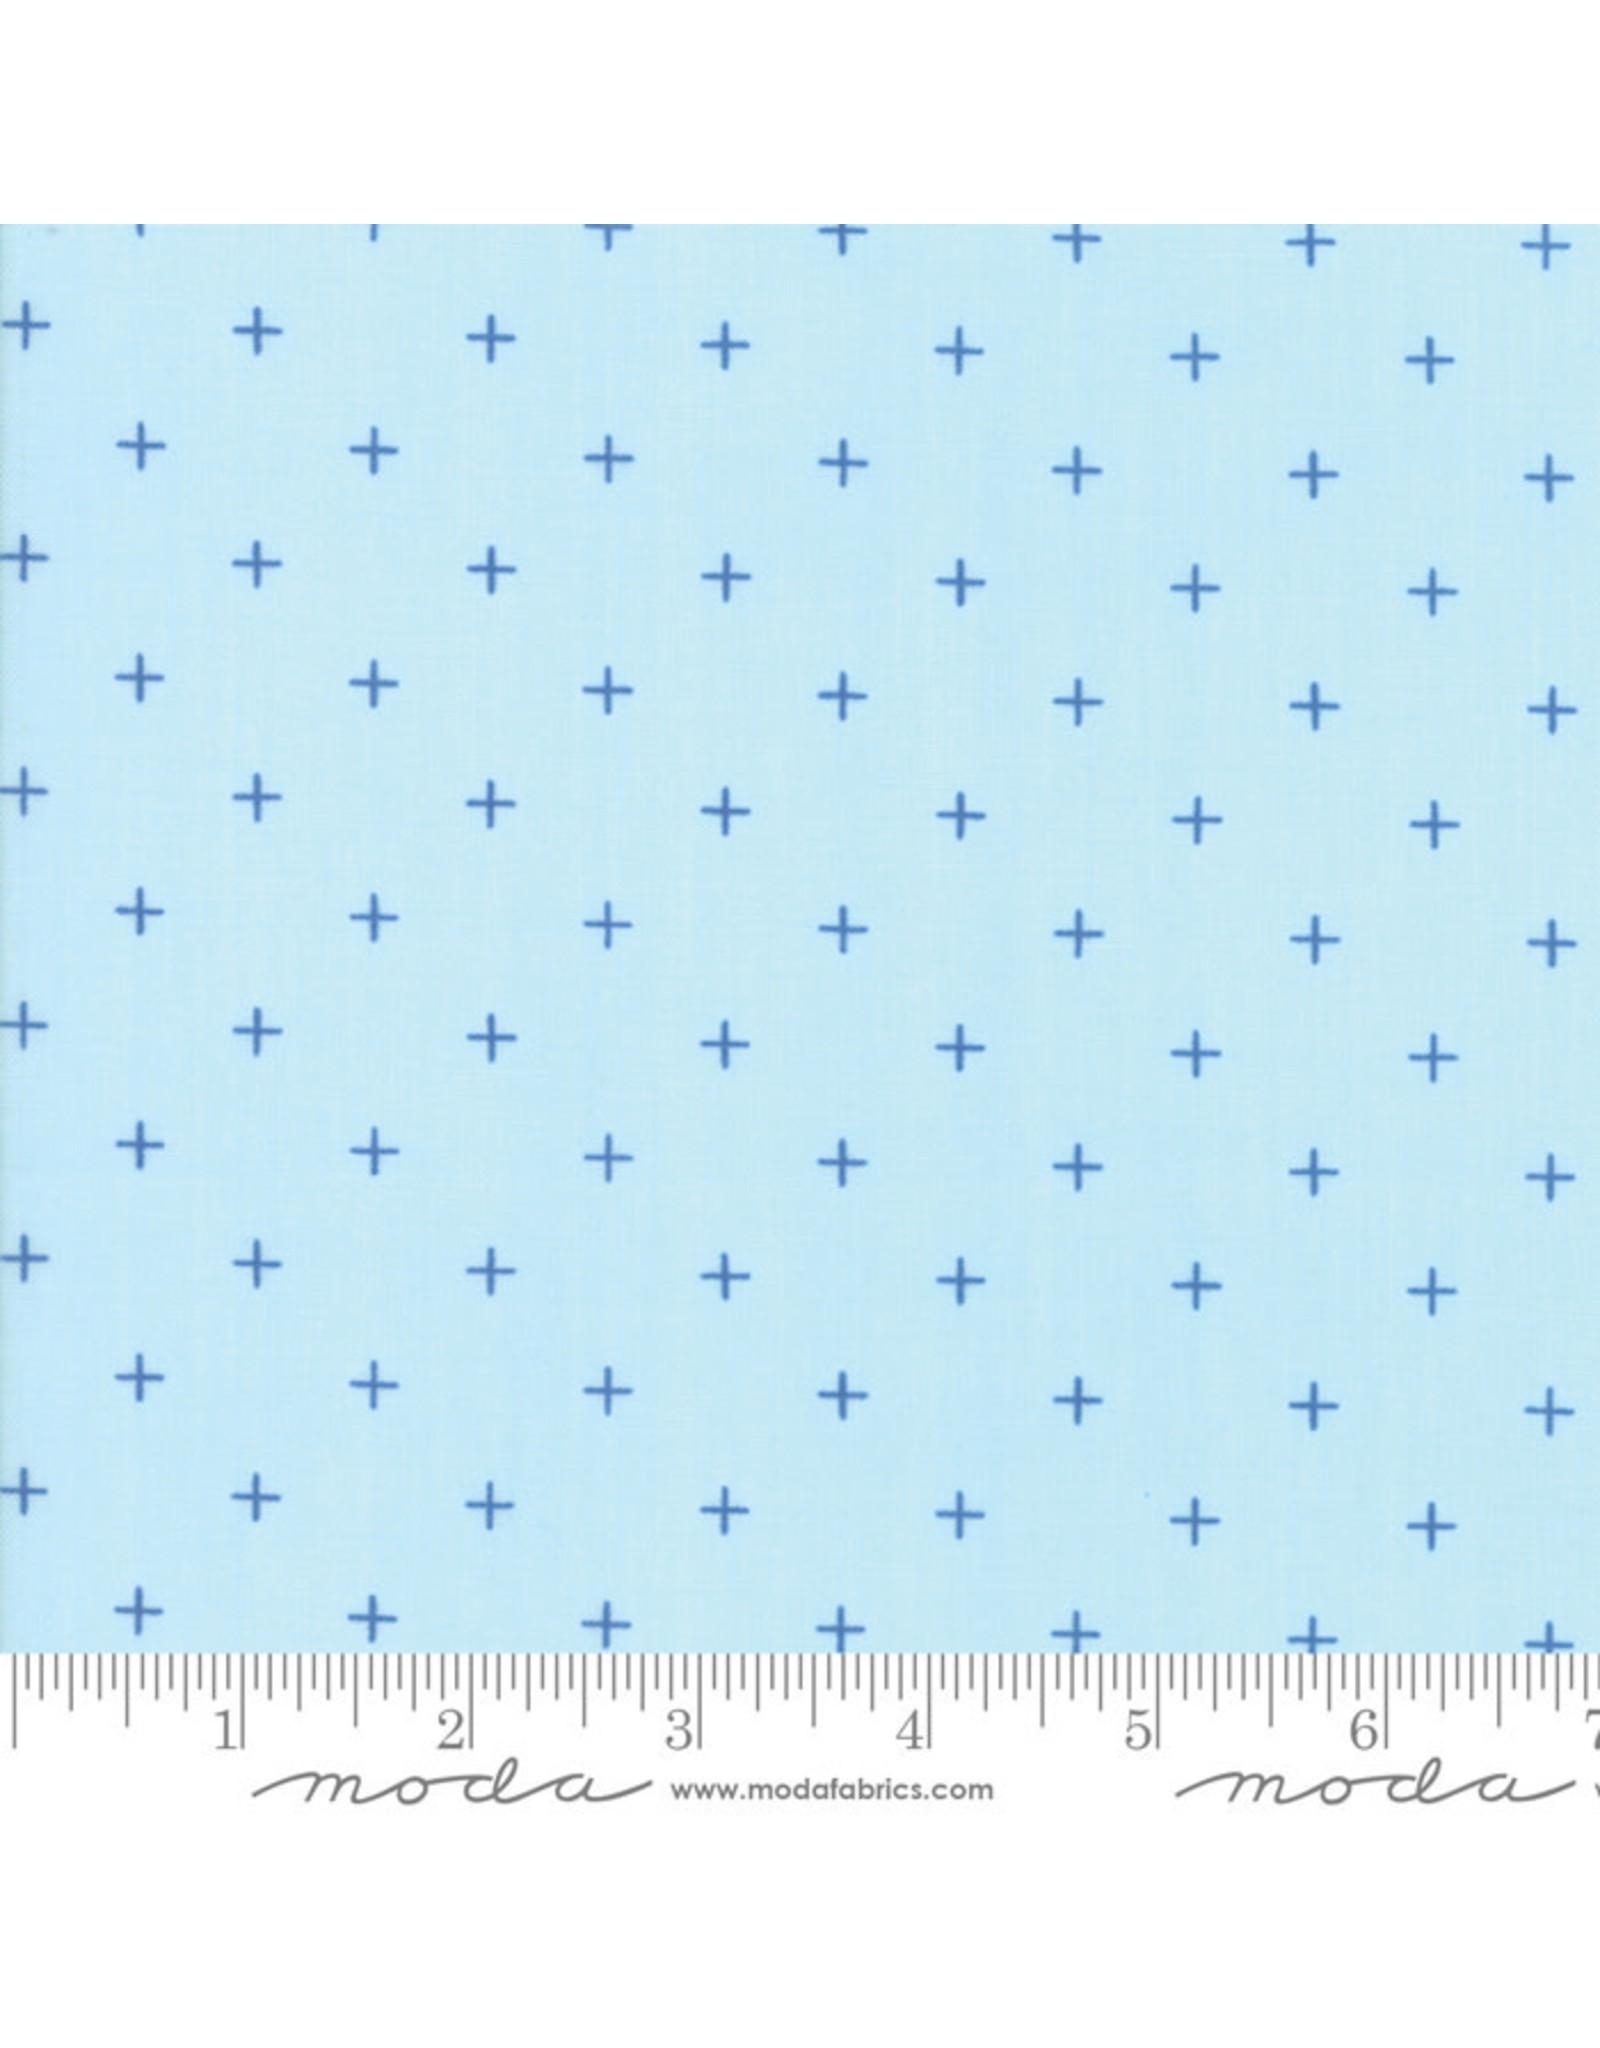 Moda Breeze - Pluses Light Blue coupon (± 37 x 110 cm)